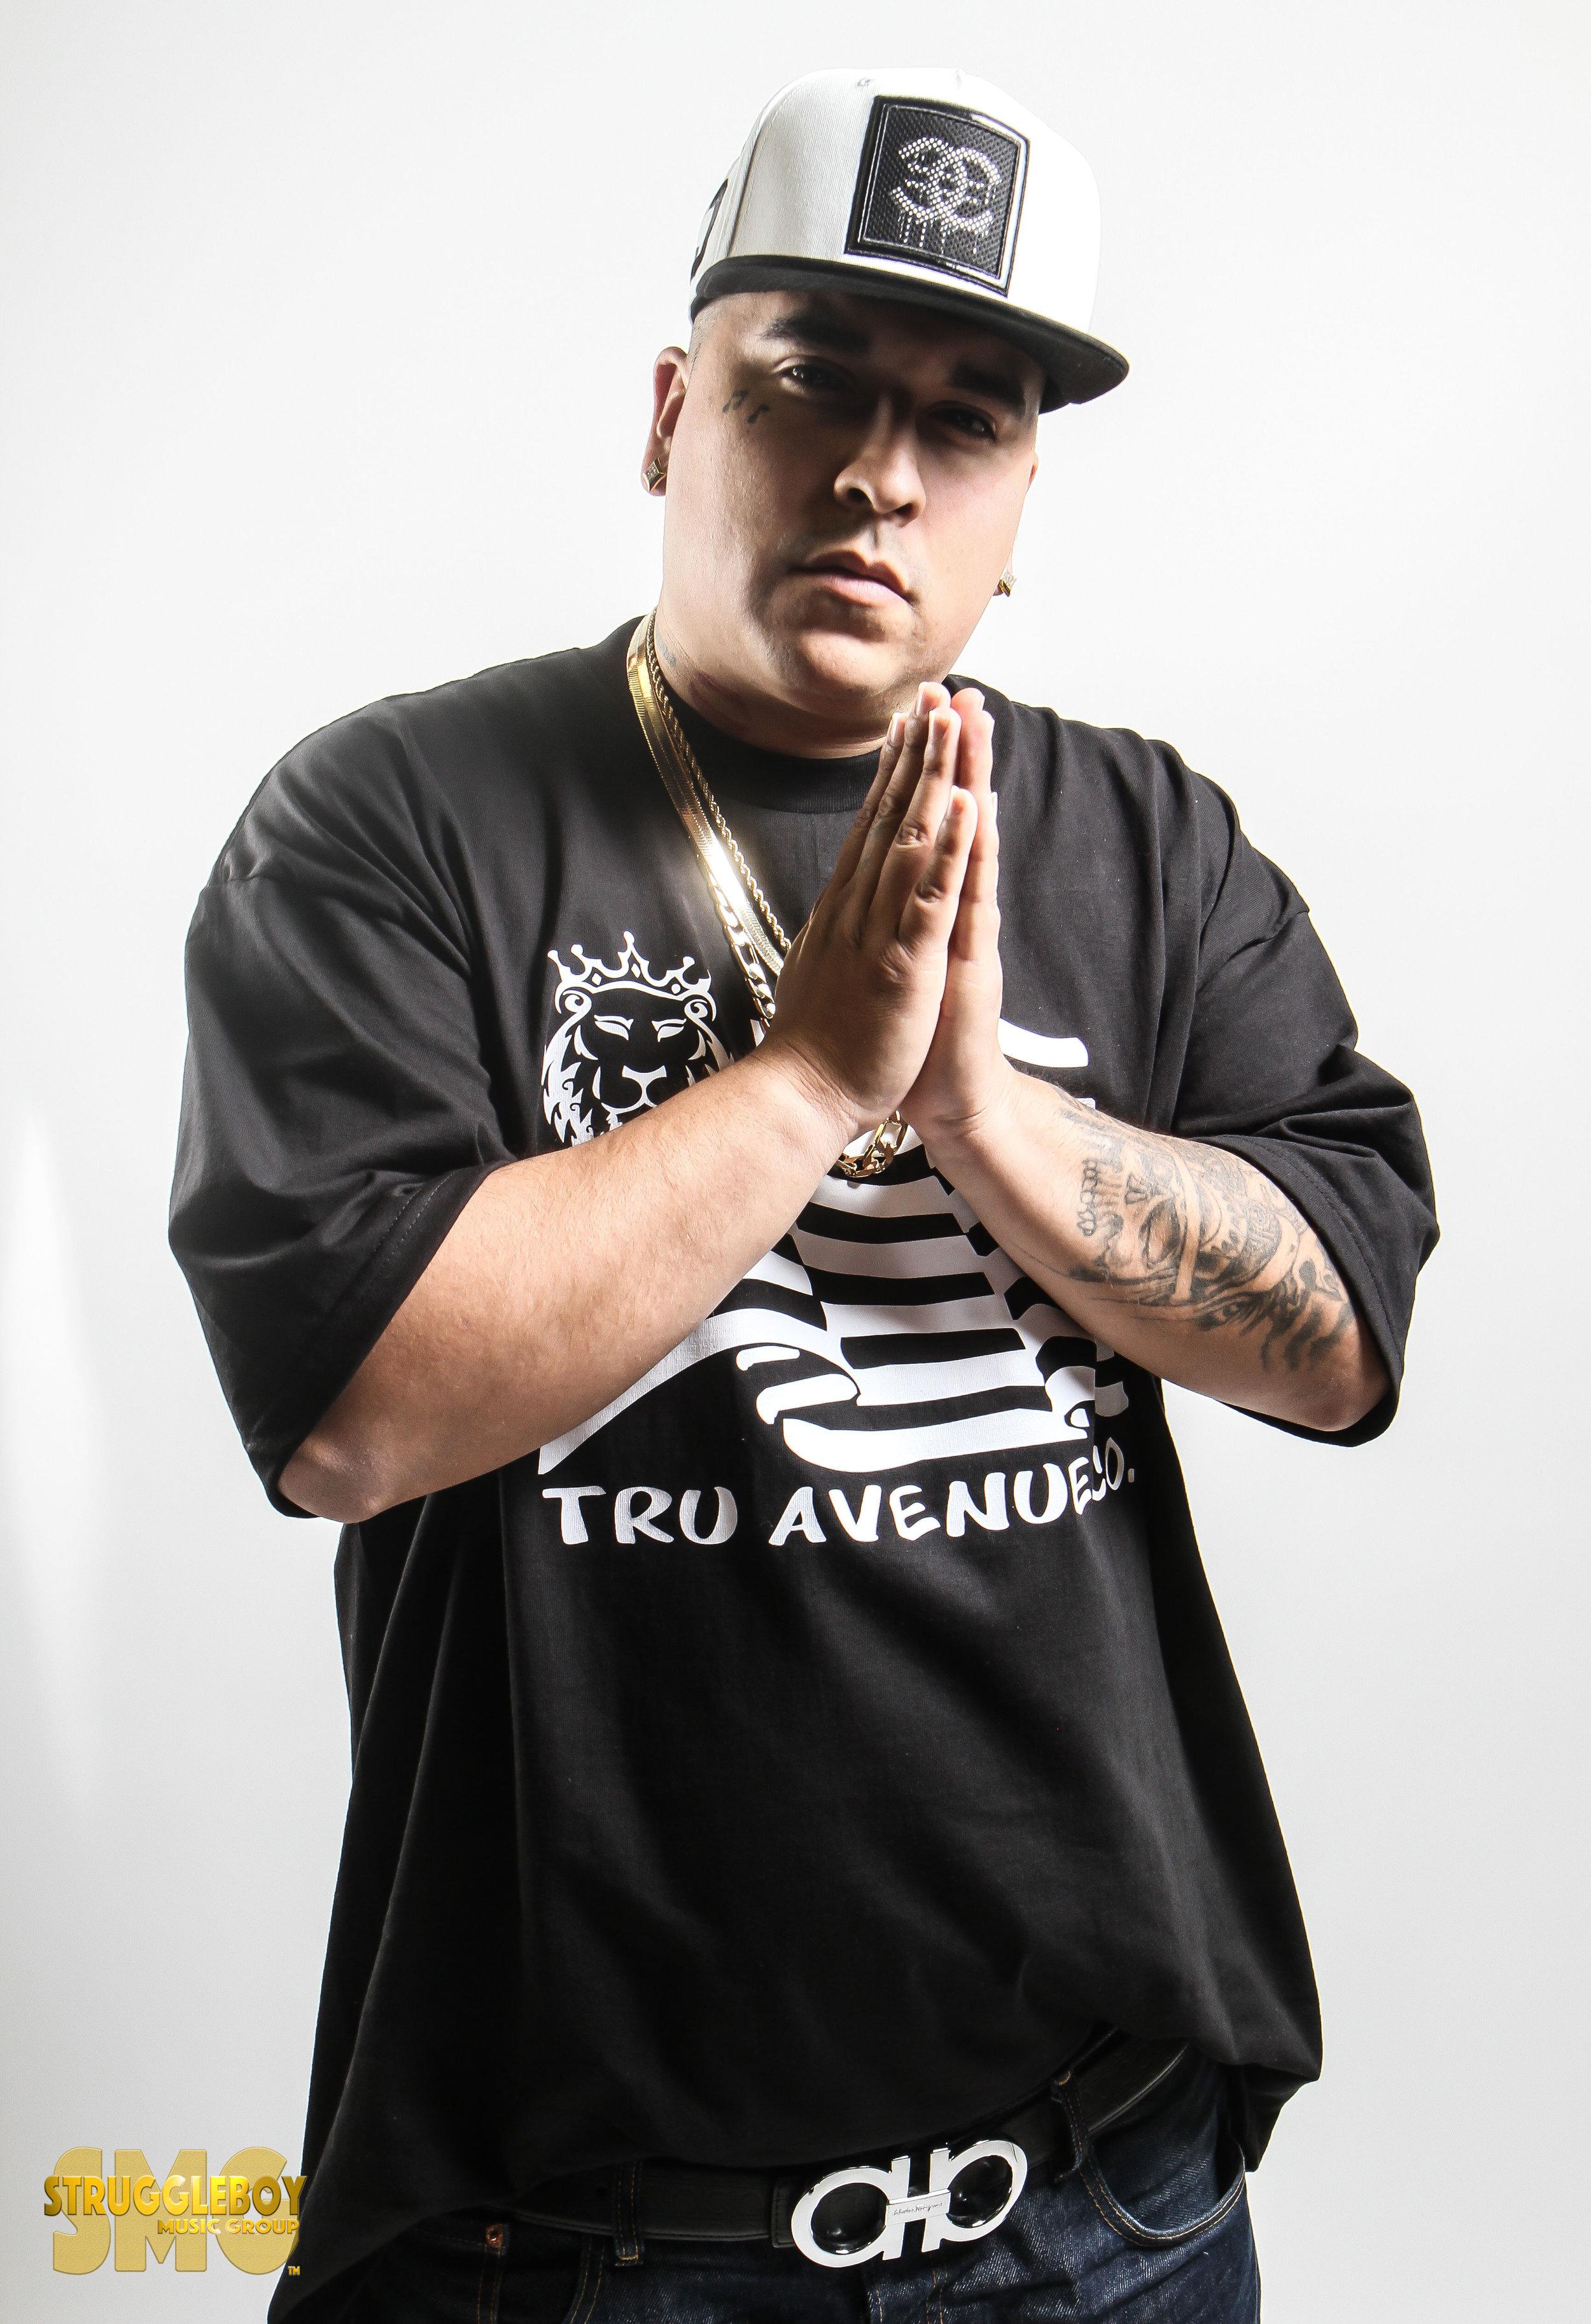 THREAT - Hip Hop Music/Actor